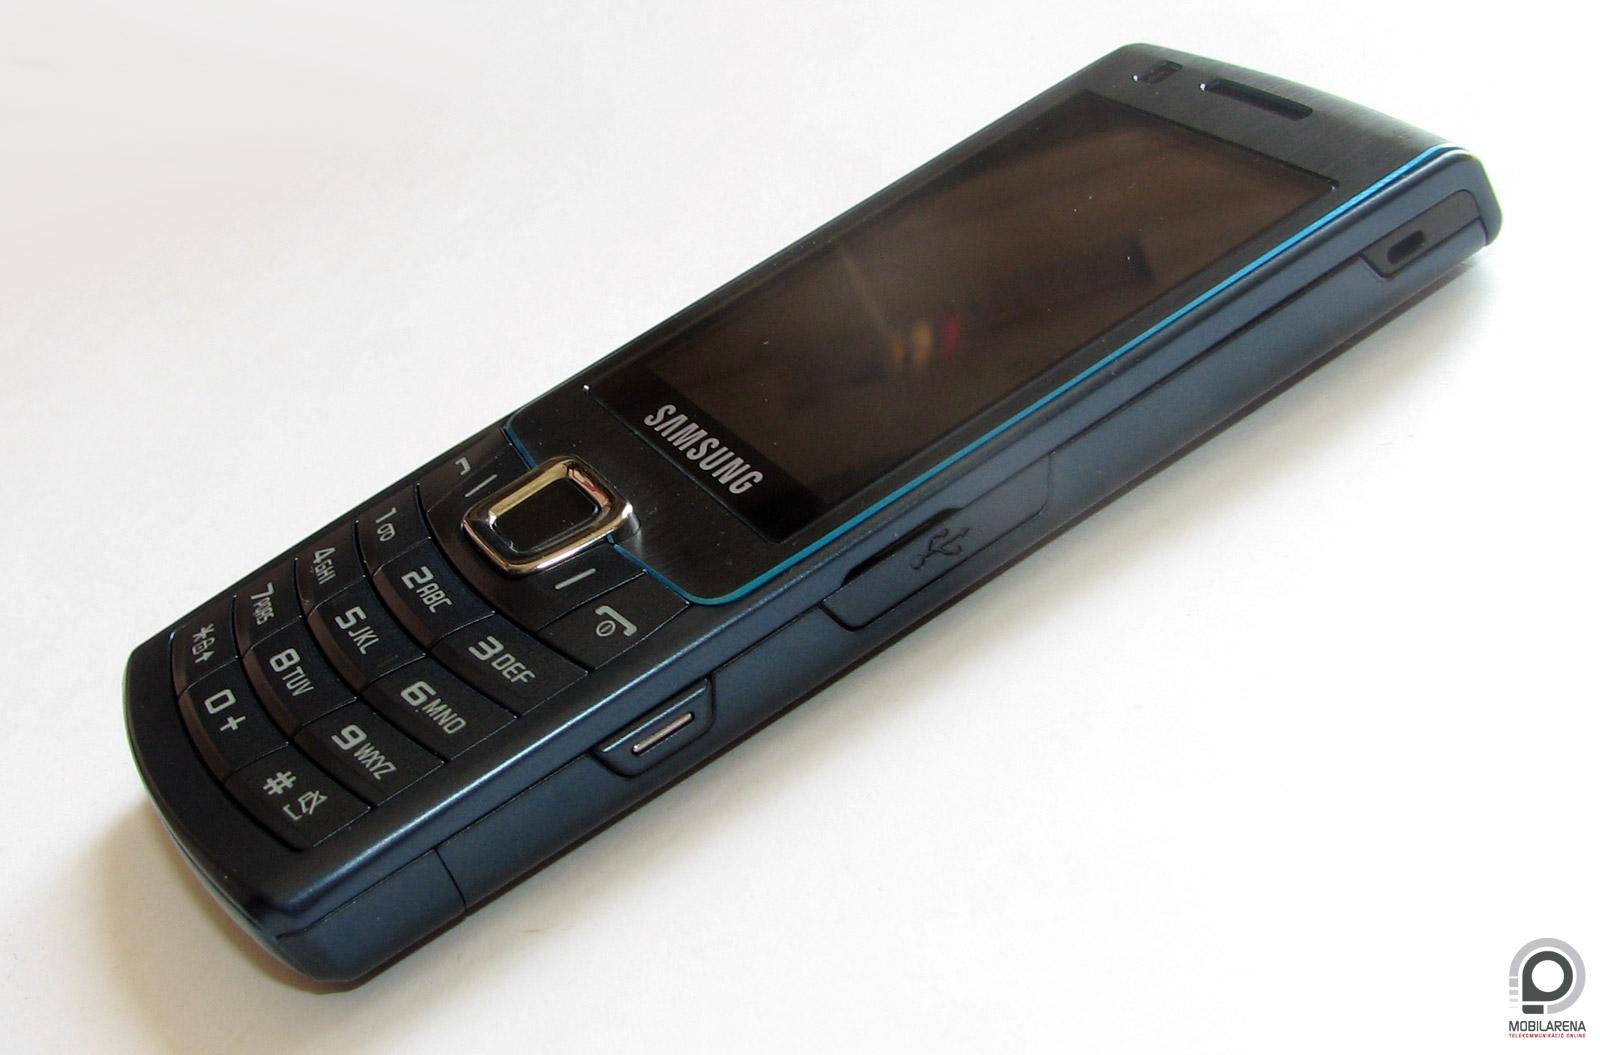 Samsung S7220   an outstanding display   Mobilarena MobileArsenal